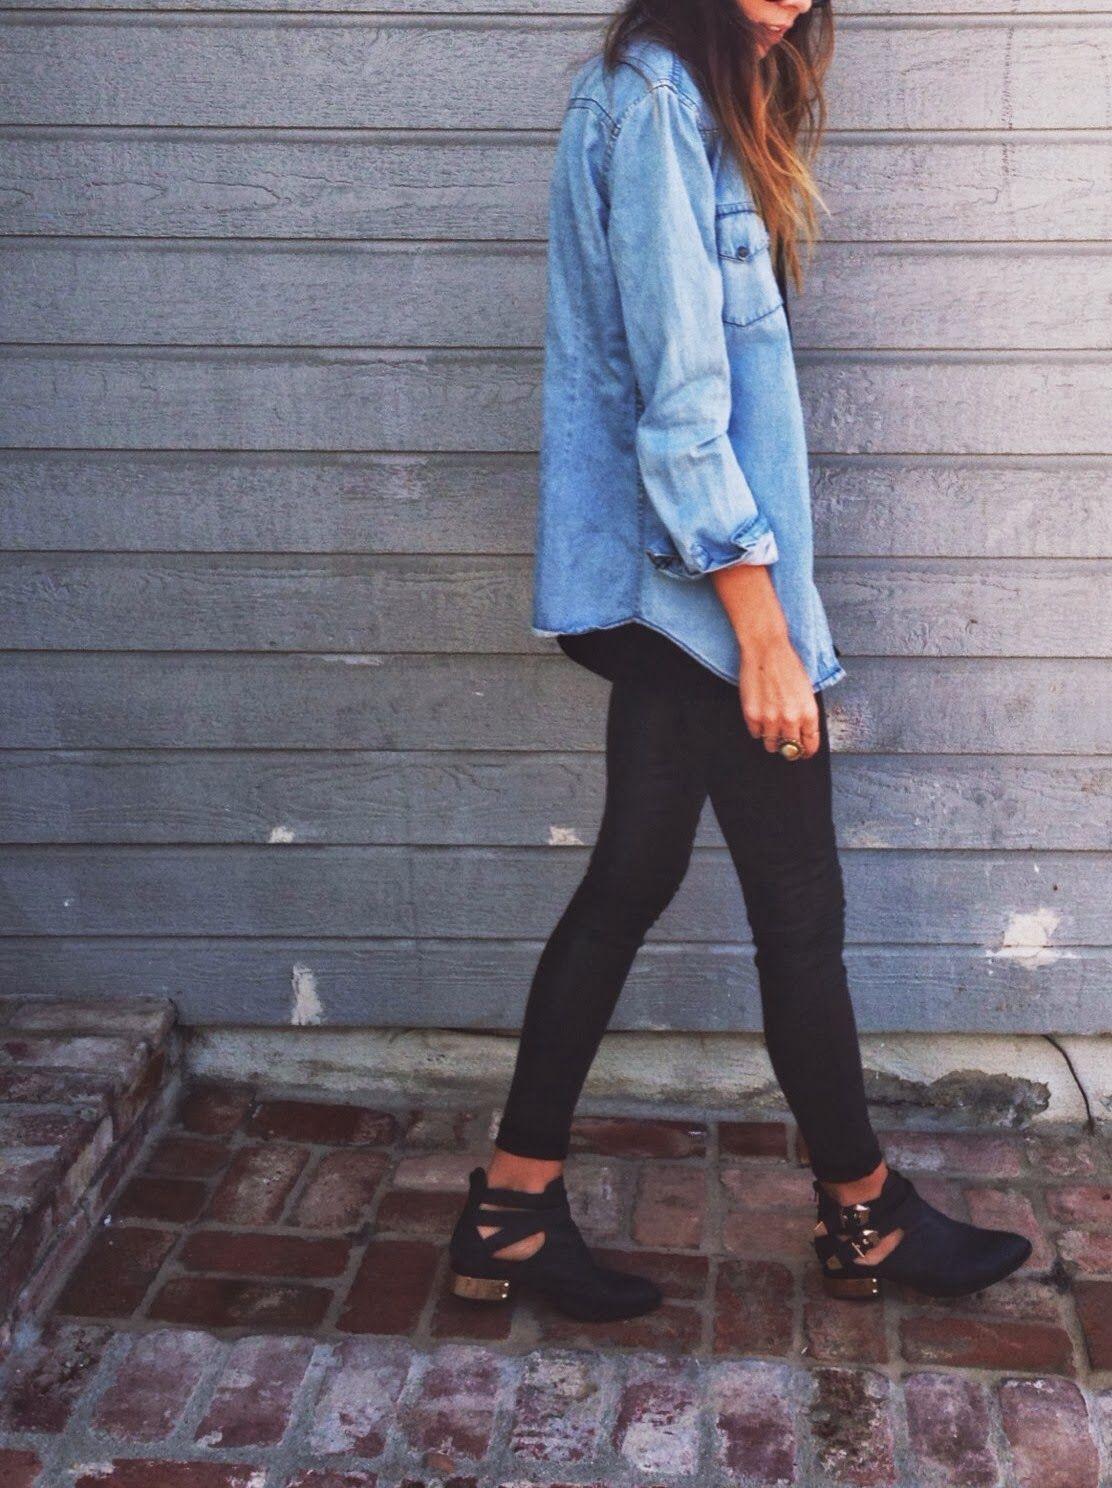 oversized jean shirt + black leggings + scarf tied in a